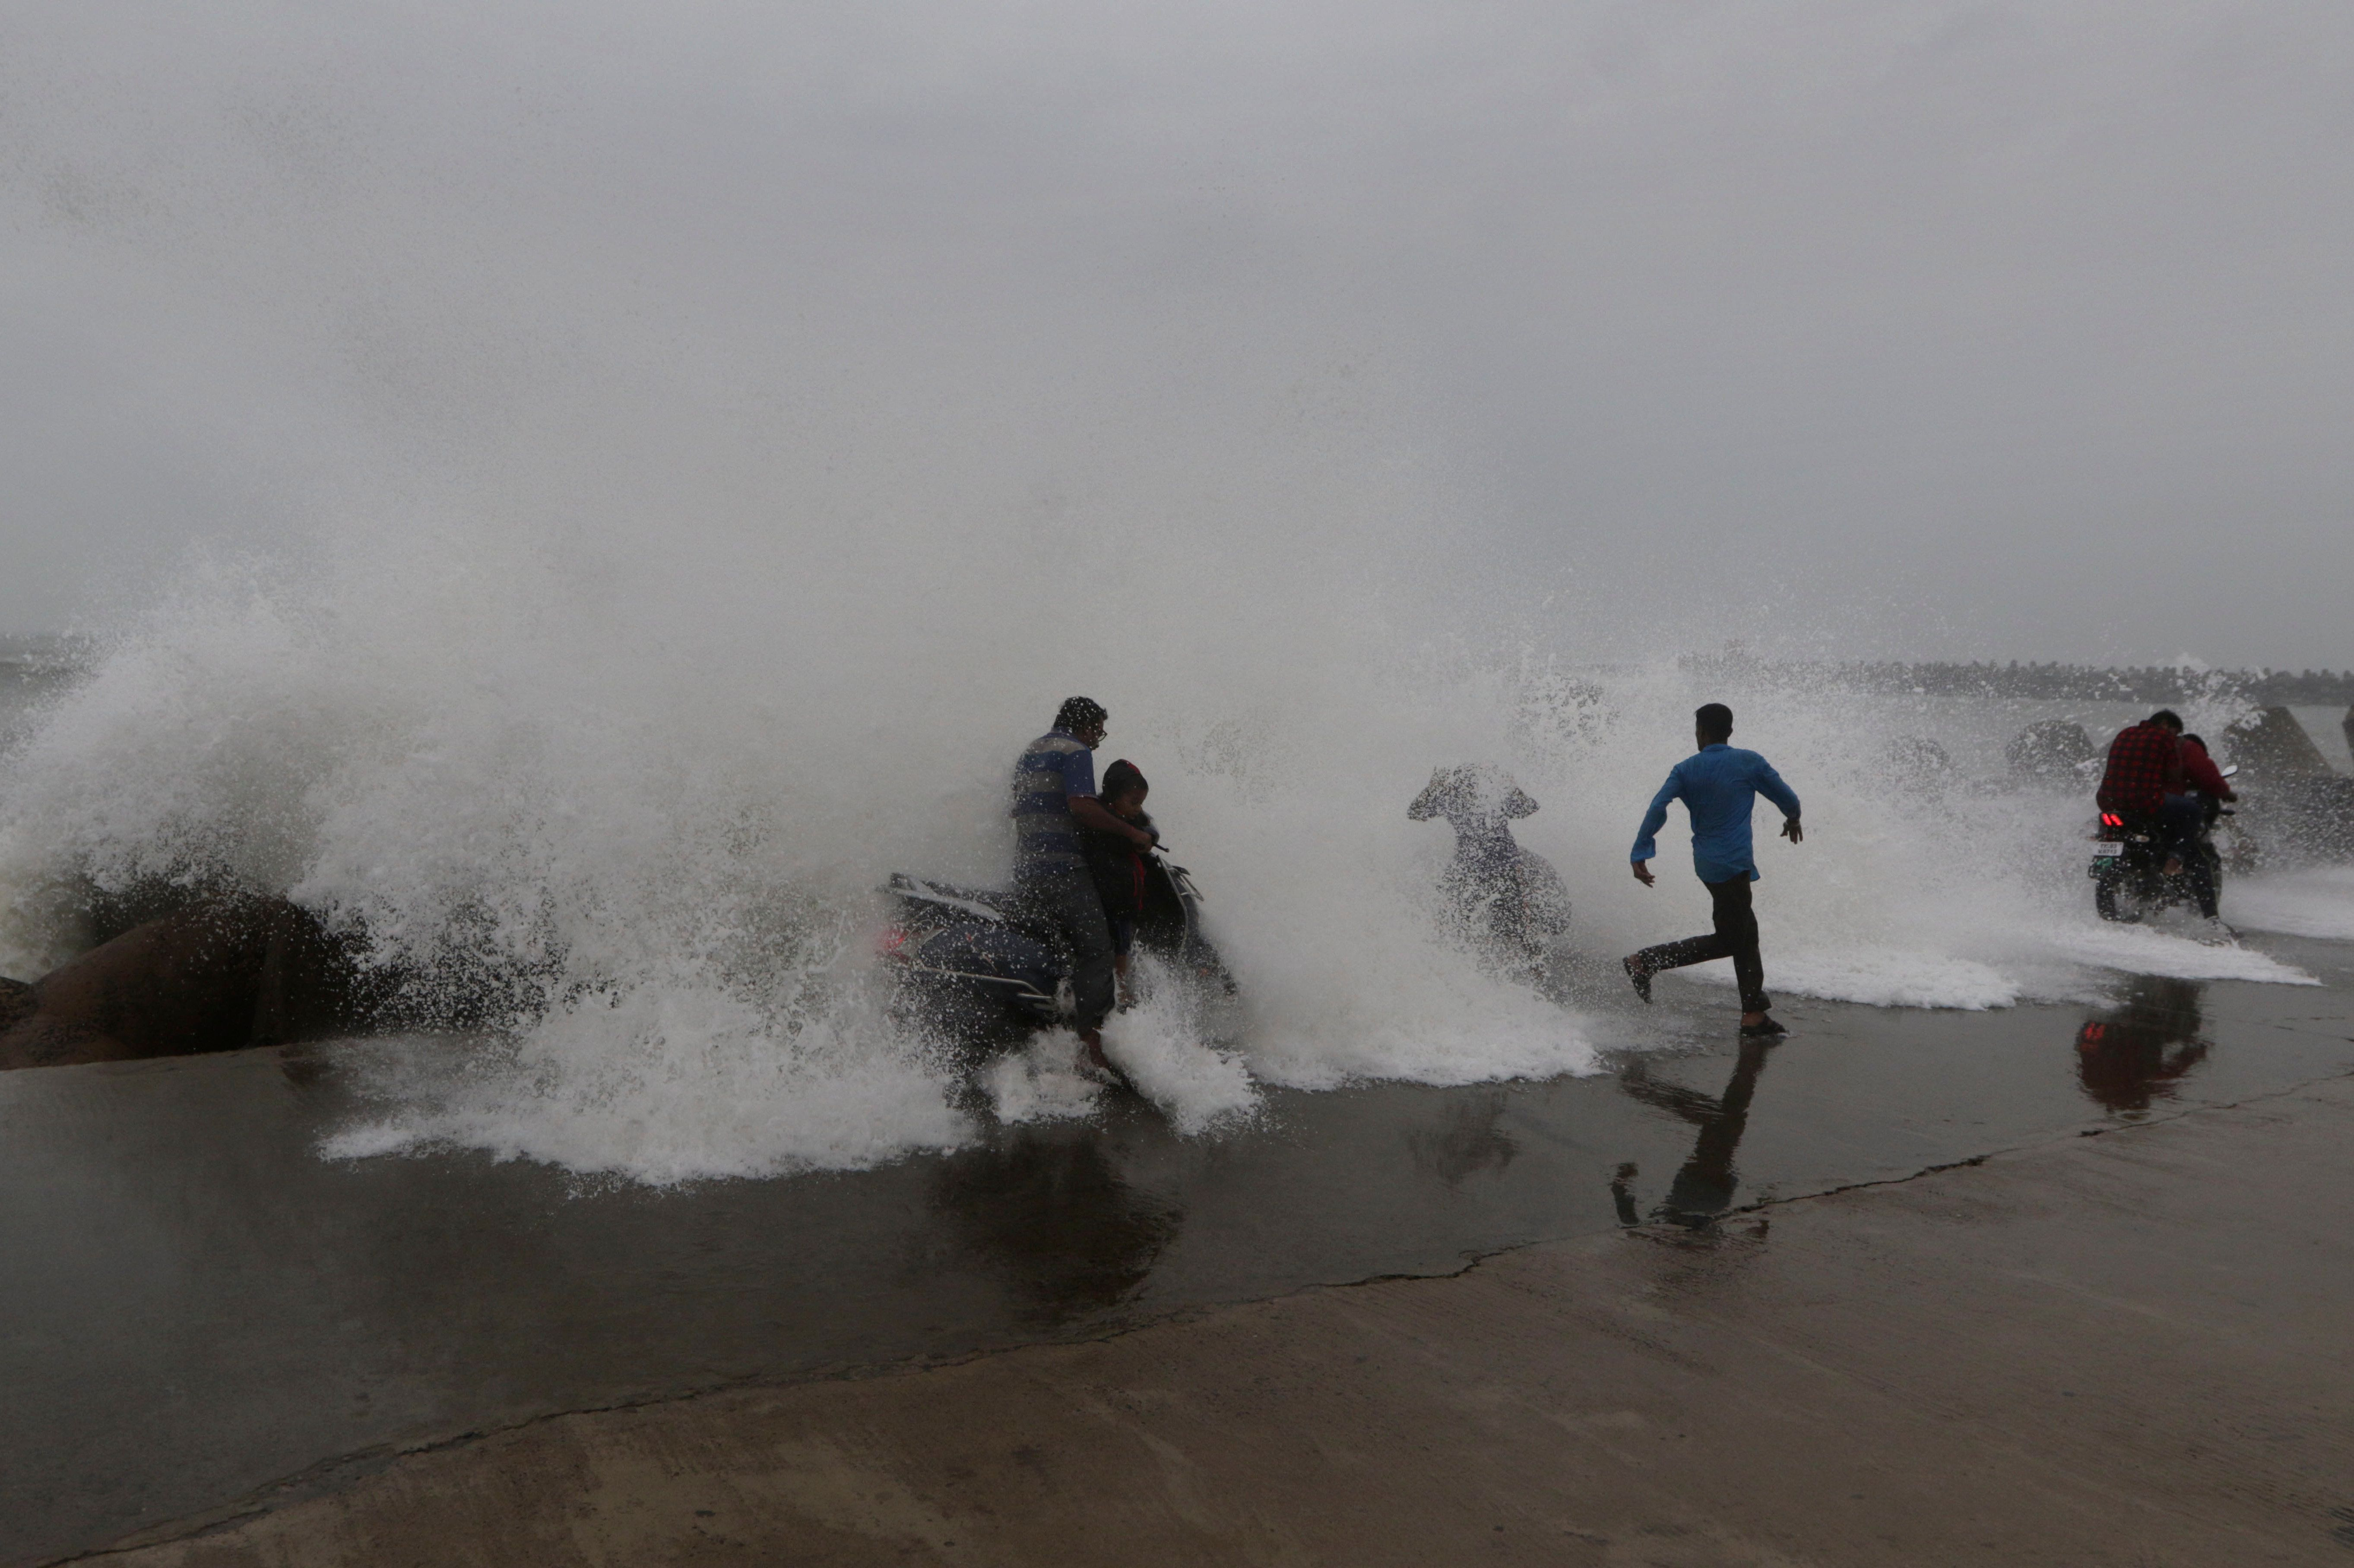 Cyclone Phethai Barrels Through Andhra Pradesh, One